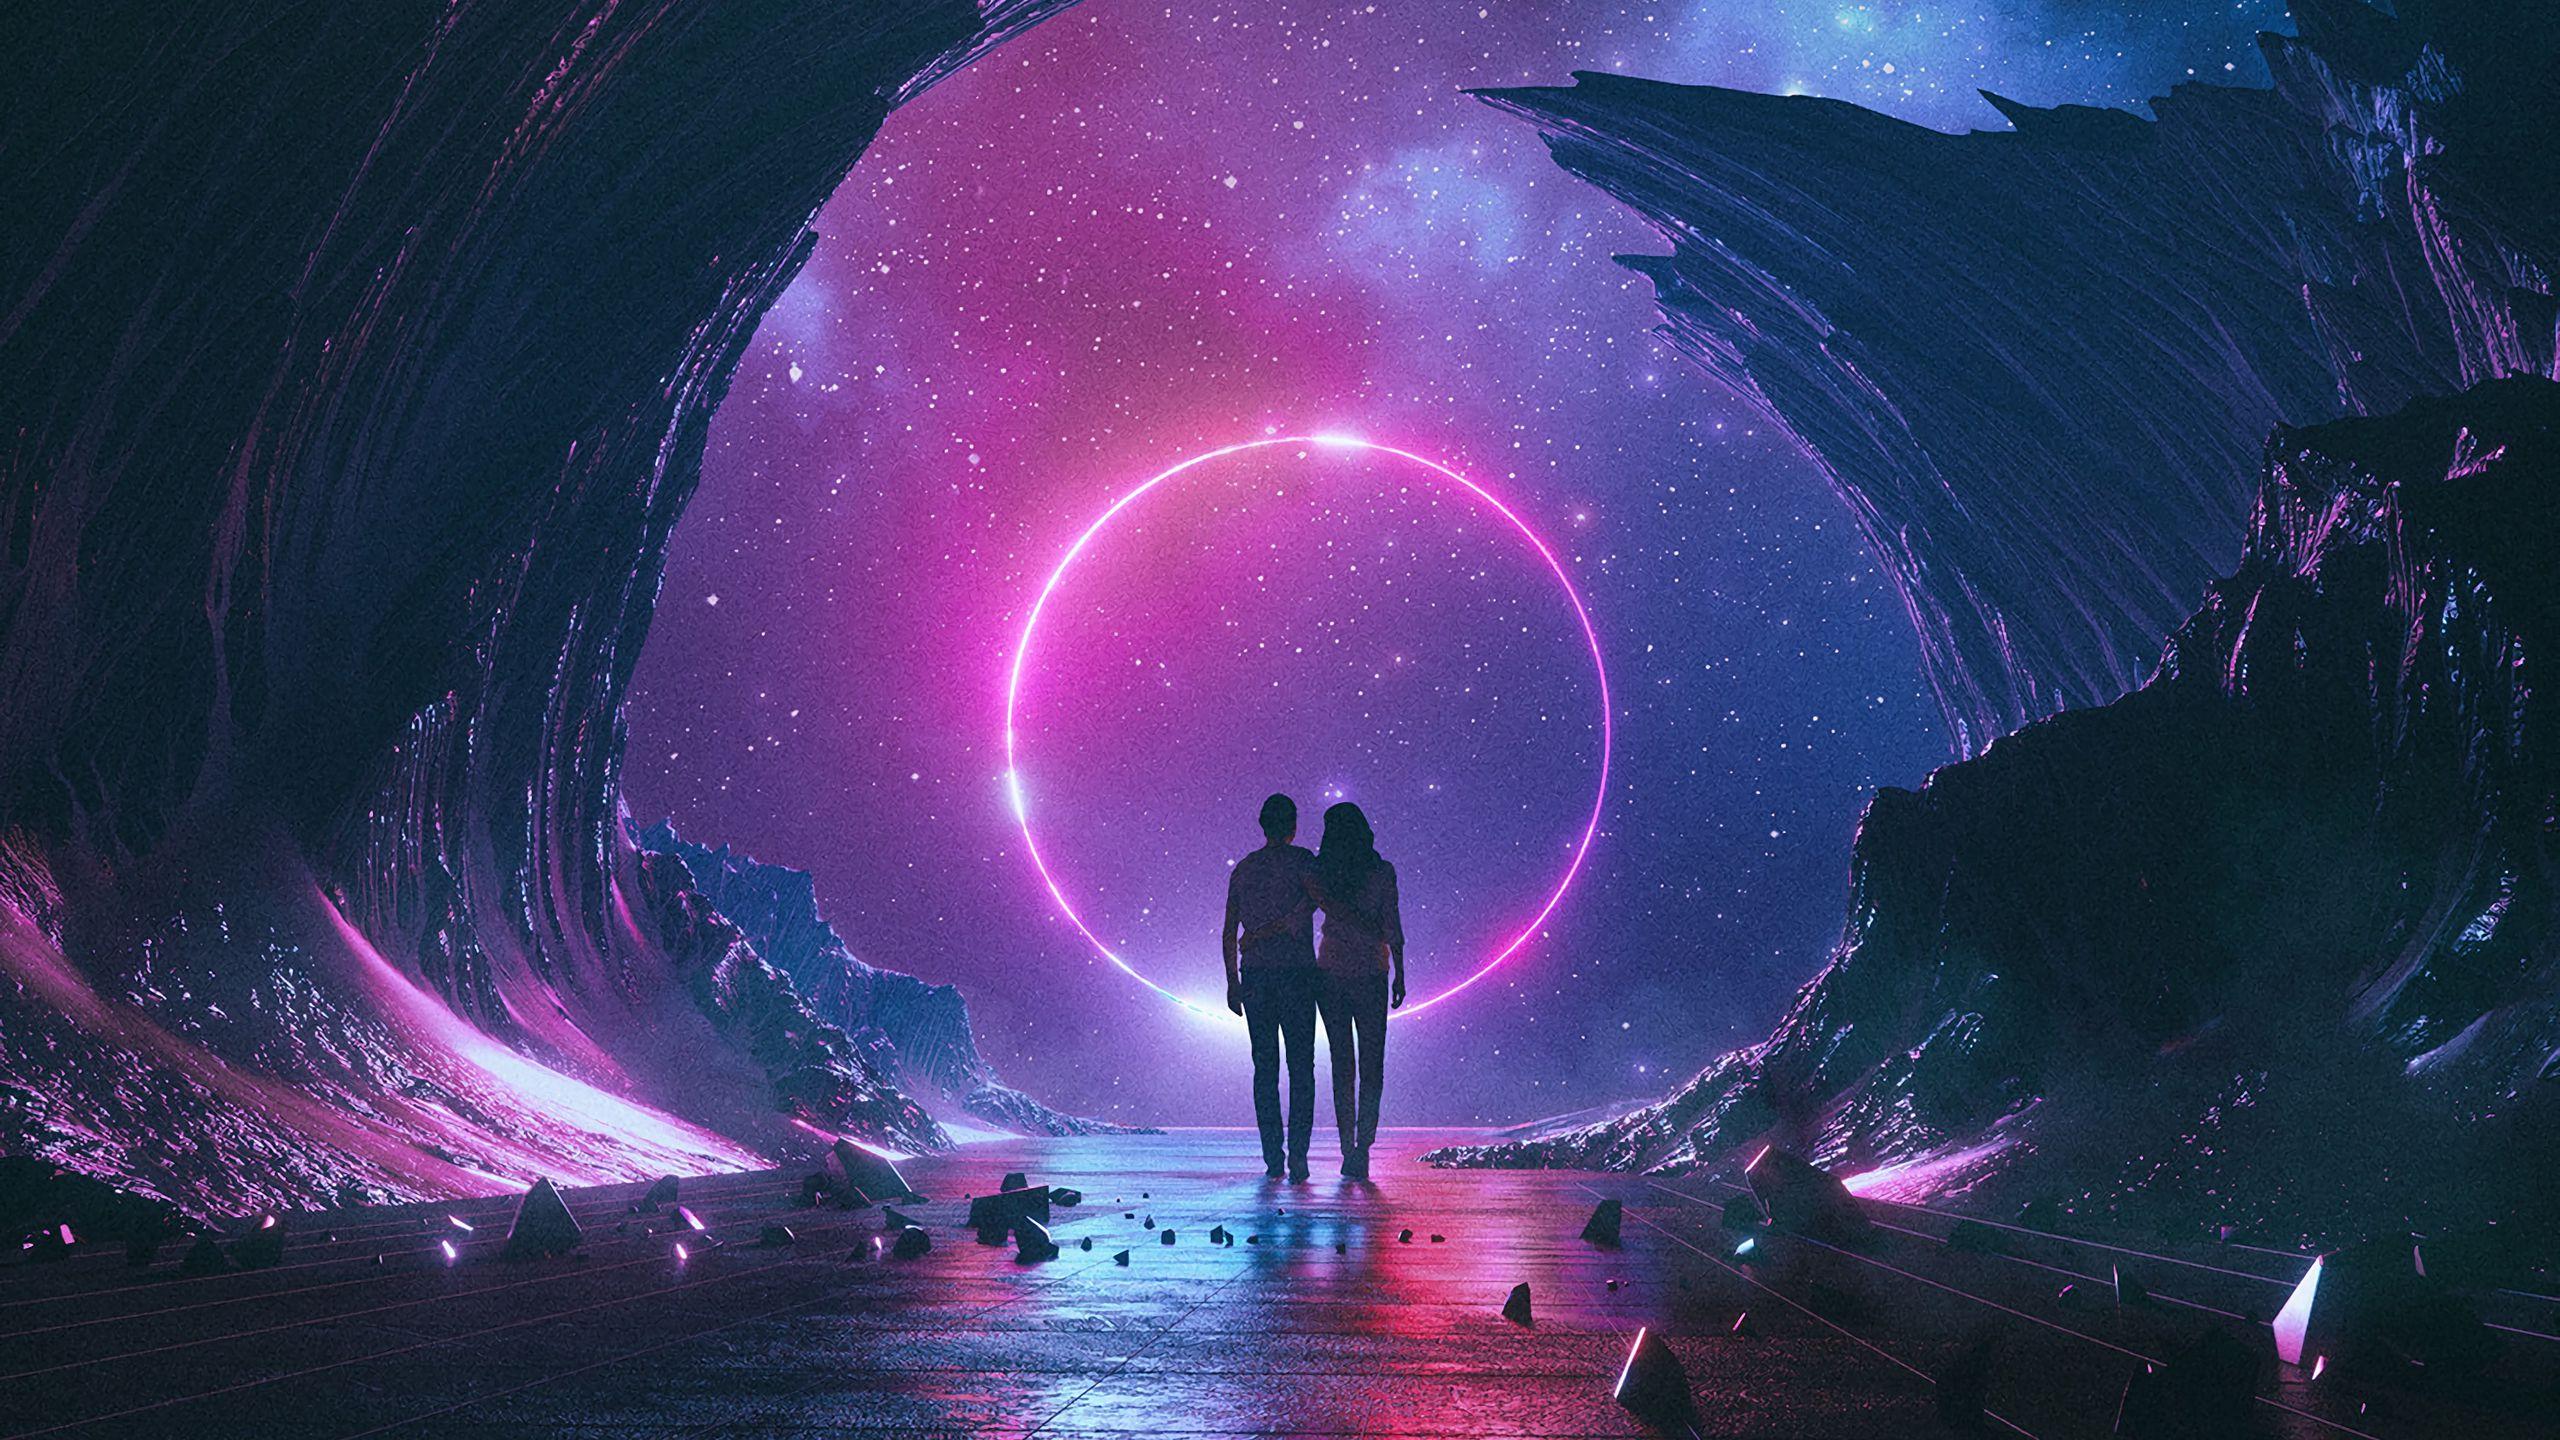 2560x1440 Wallpaper couple, starry sky, art, space, hugs